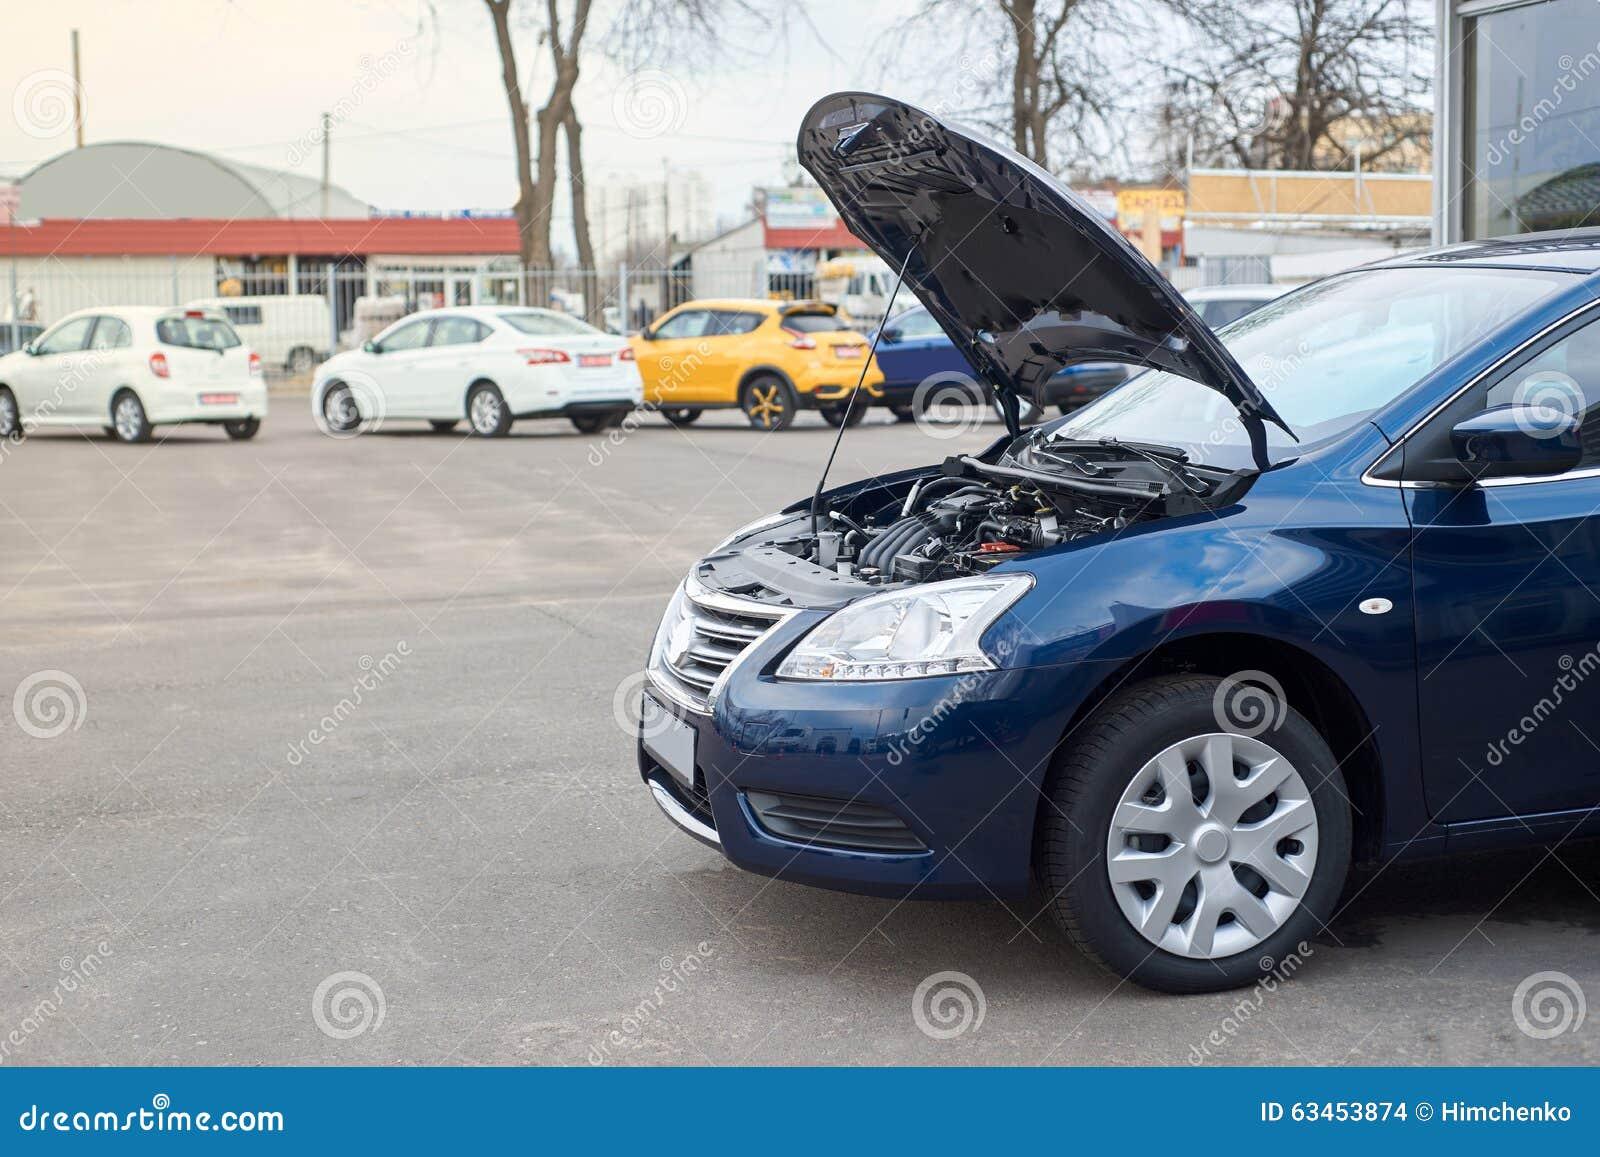 Car Broke Down >> Blue Car Broke Down Stock Photo Image Of Open Lift 63453874